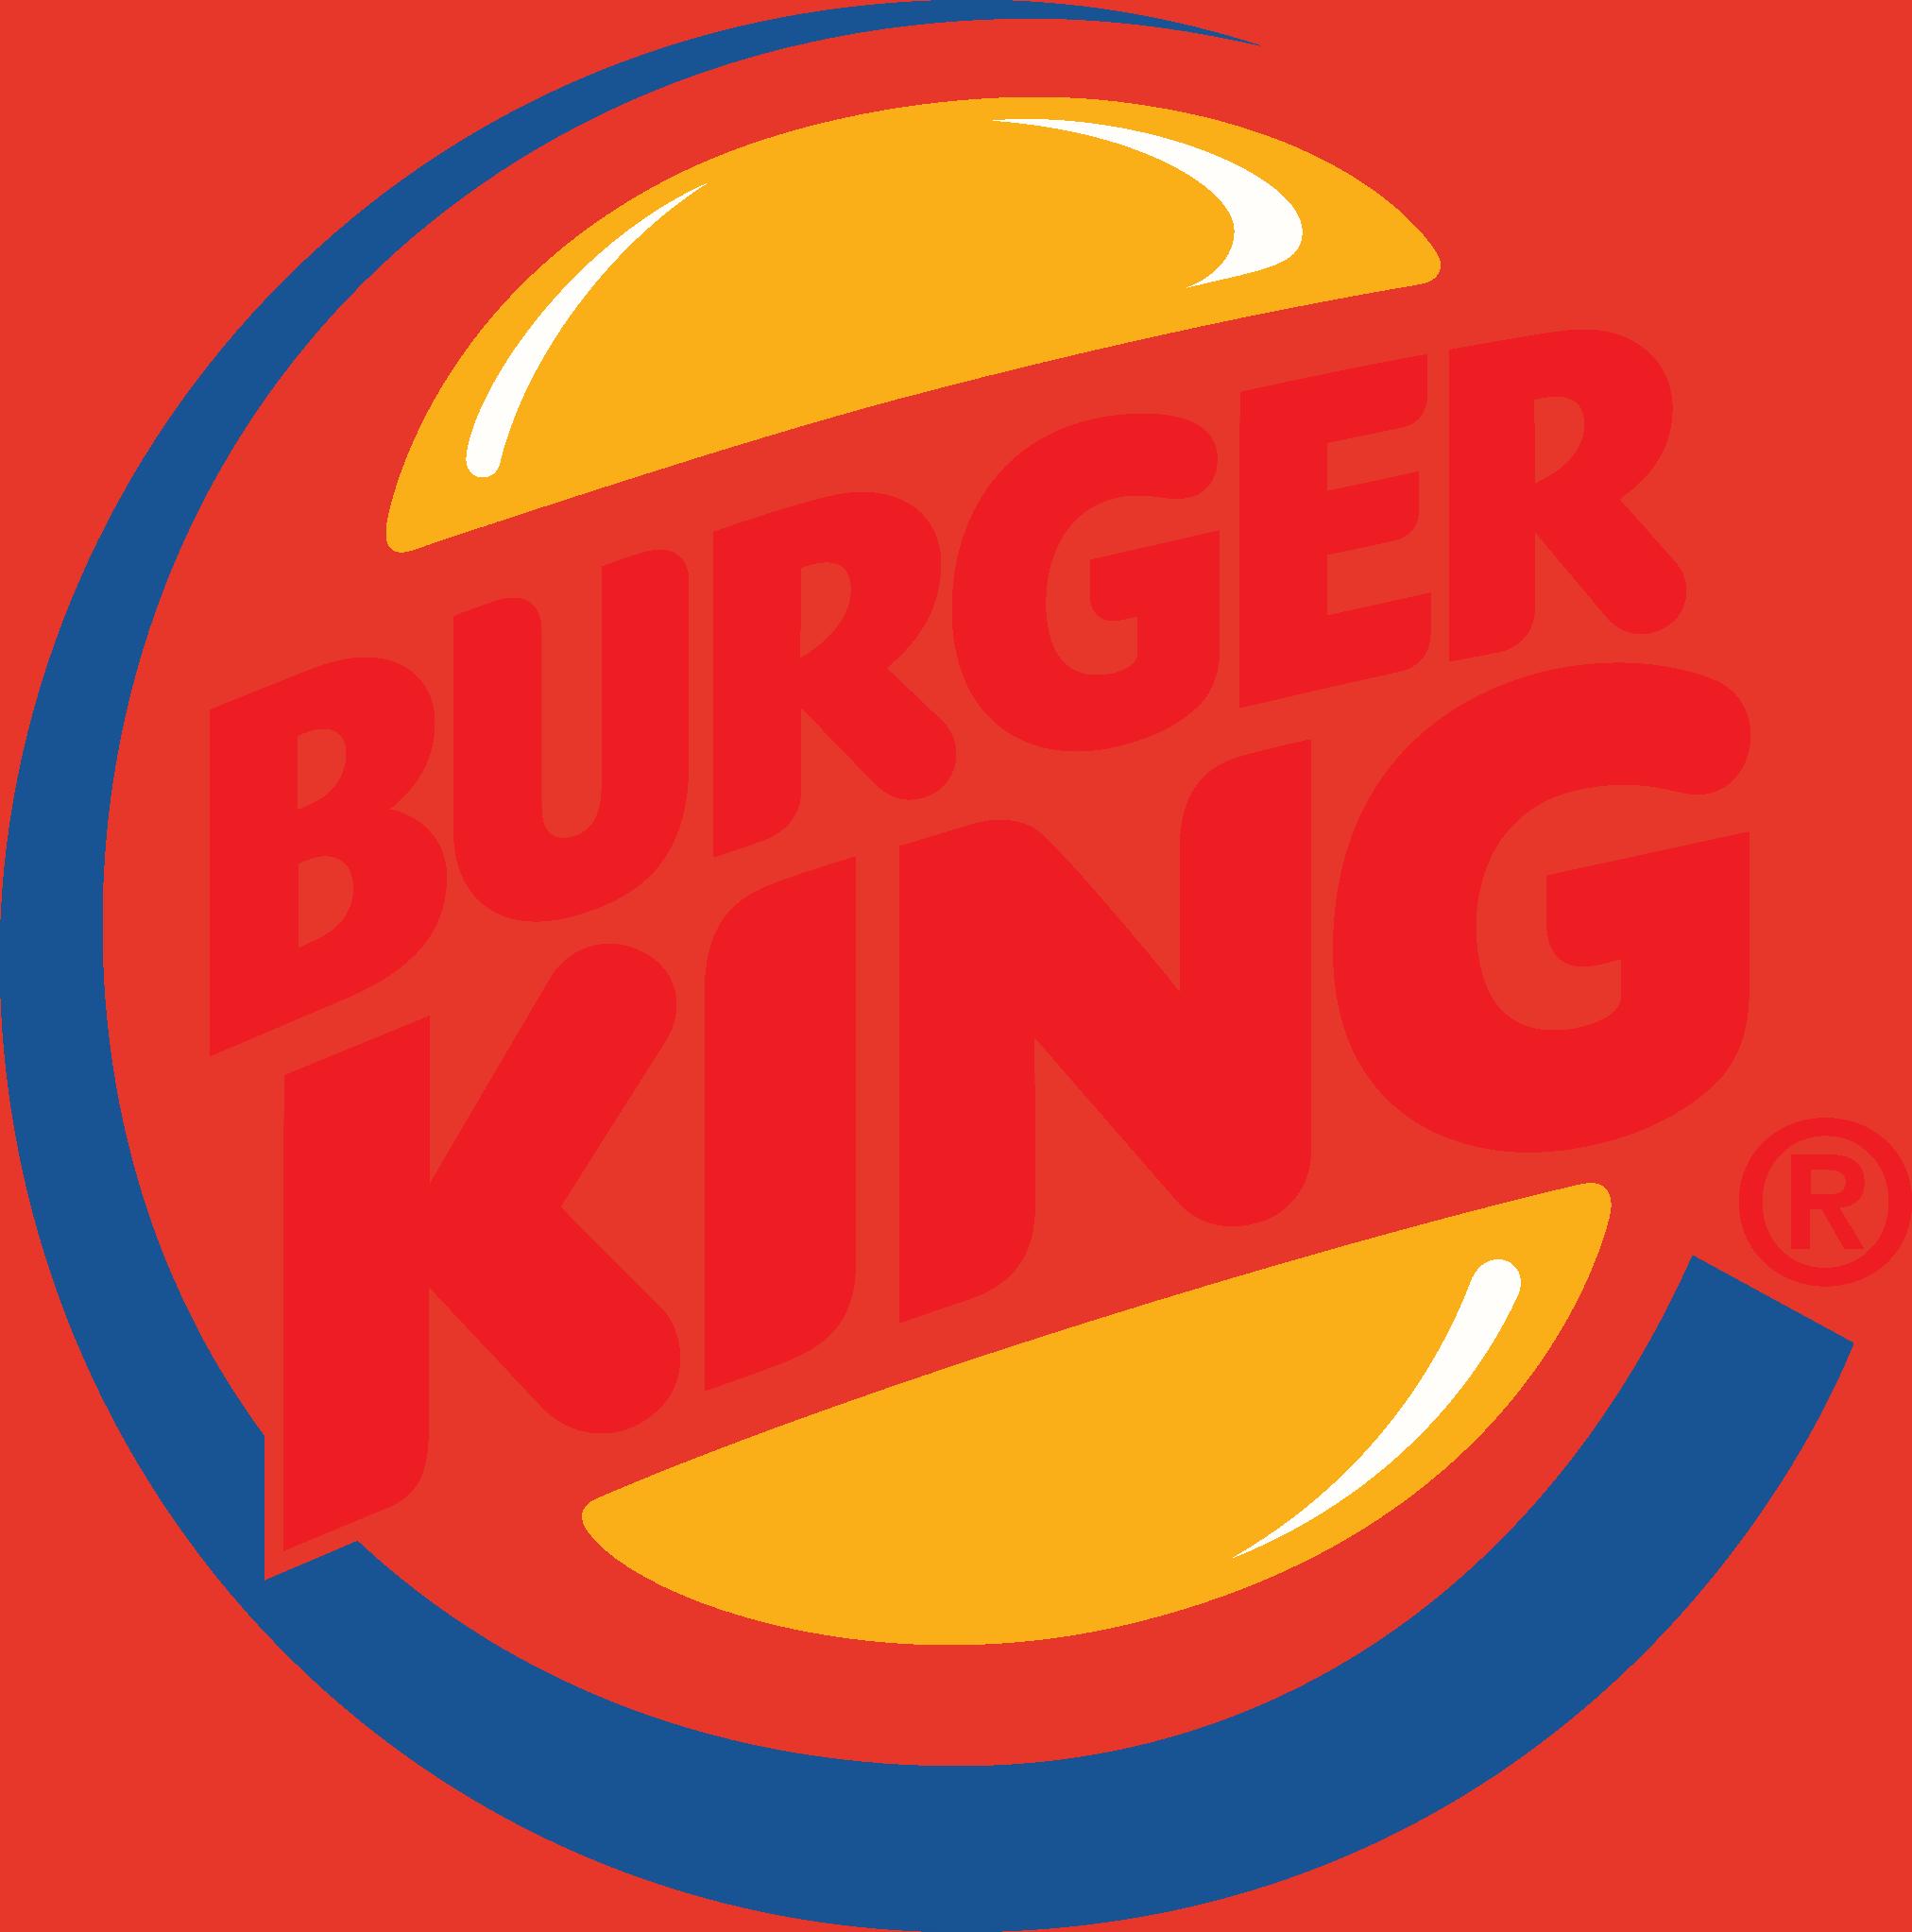 burger king student discount